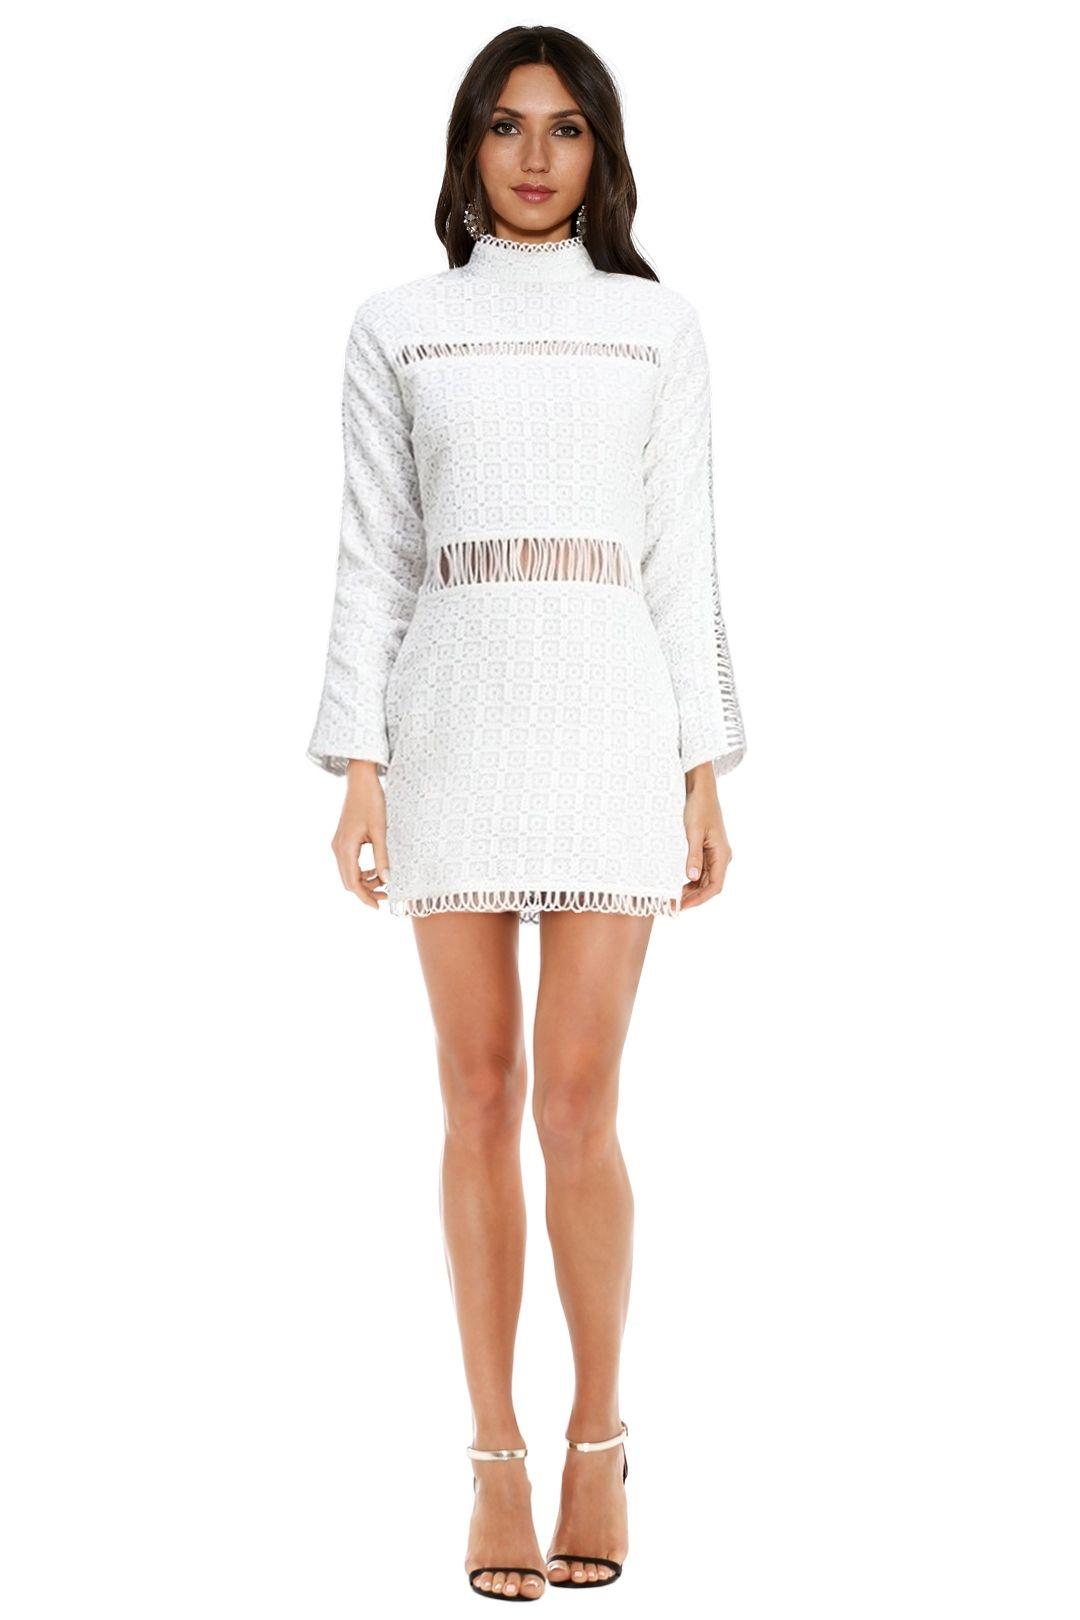 Shakuhachi - Cut Out Lace Panelled Mini Dress - White - Front